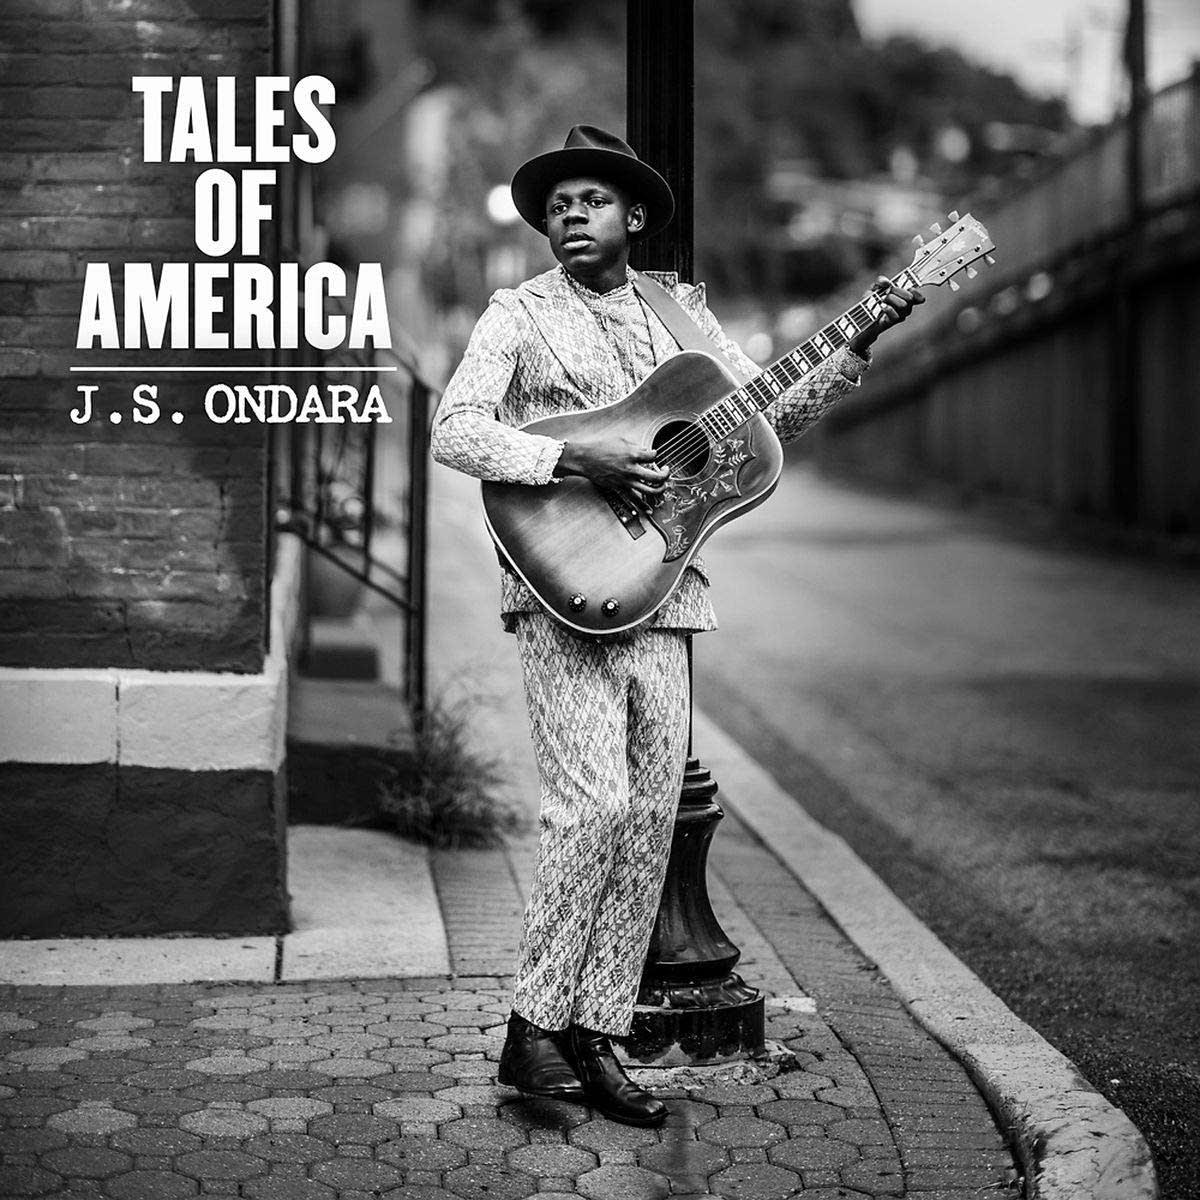 J.S. Ondara, 'Tales of America'